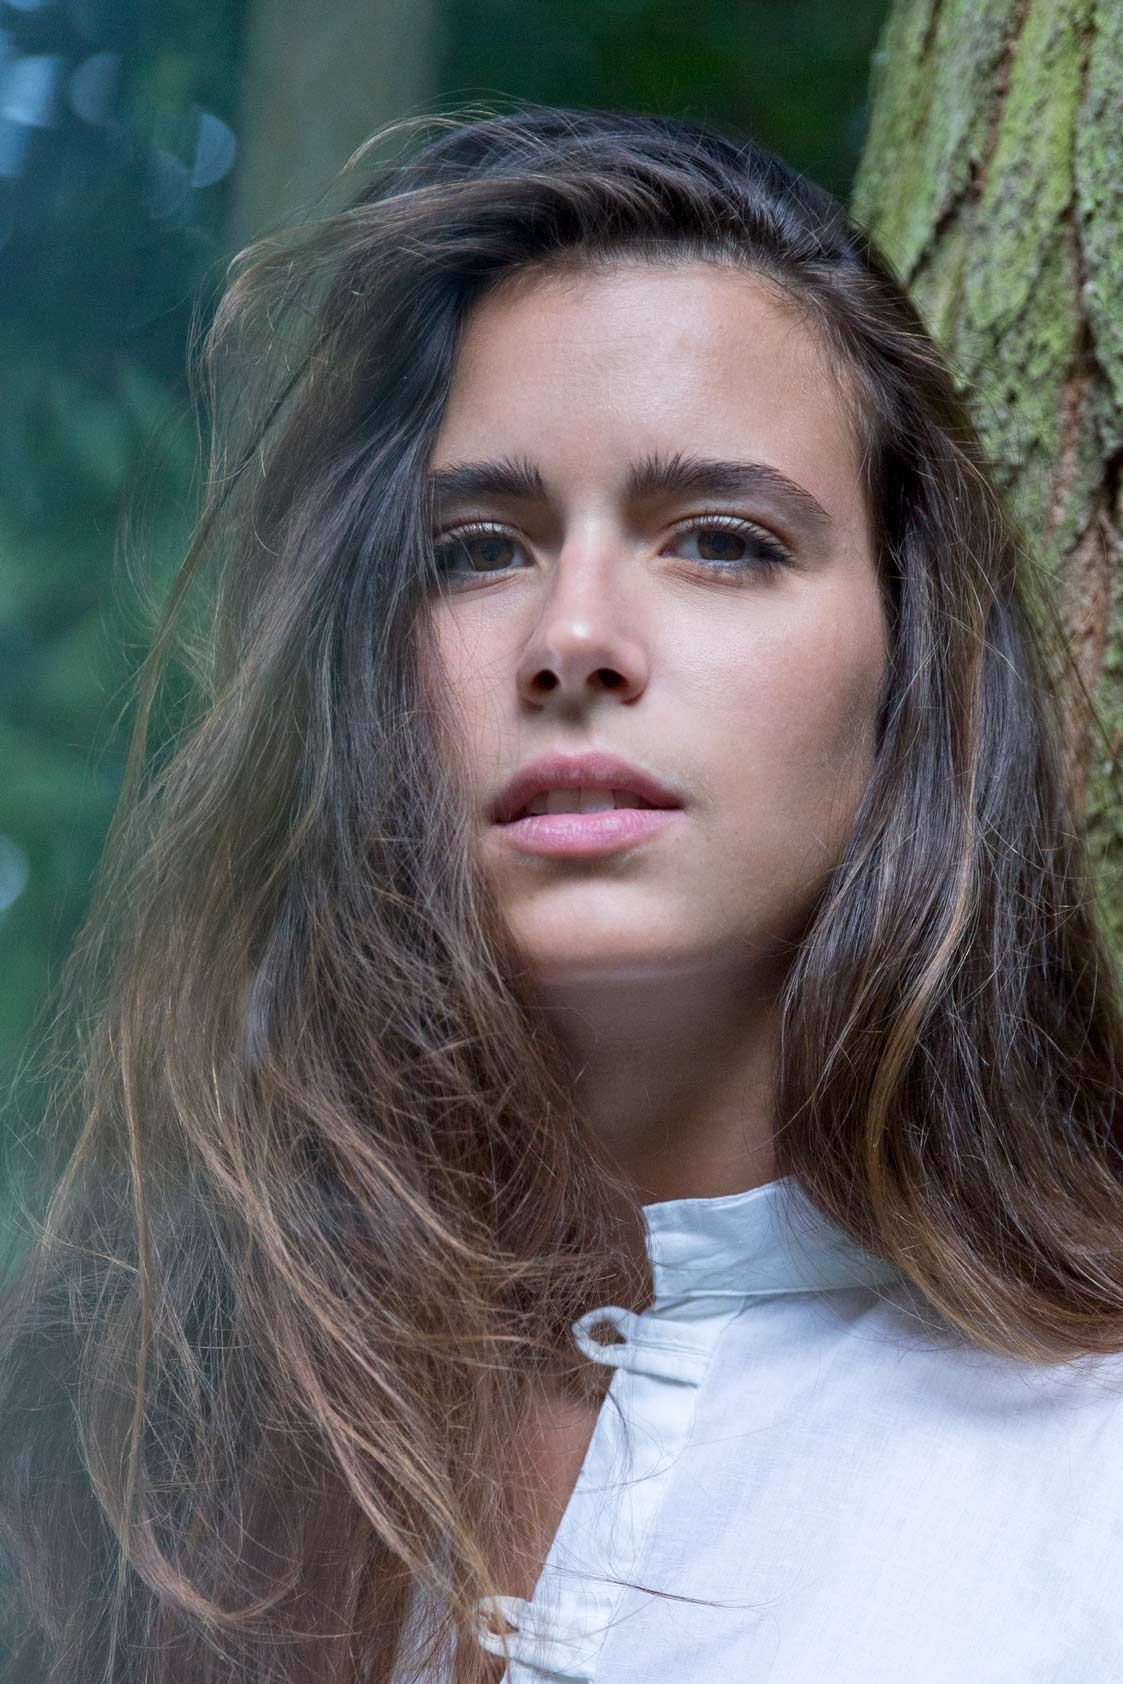 Ines-Aramburo-photographe-paris-portrait-lifestyle-seance-photo-photoshoot-photographer31.jpg